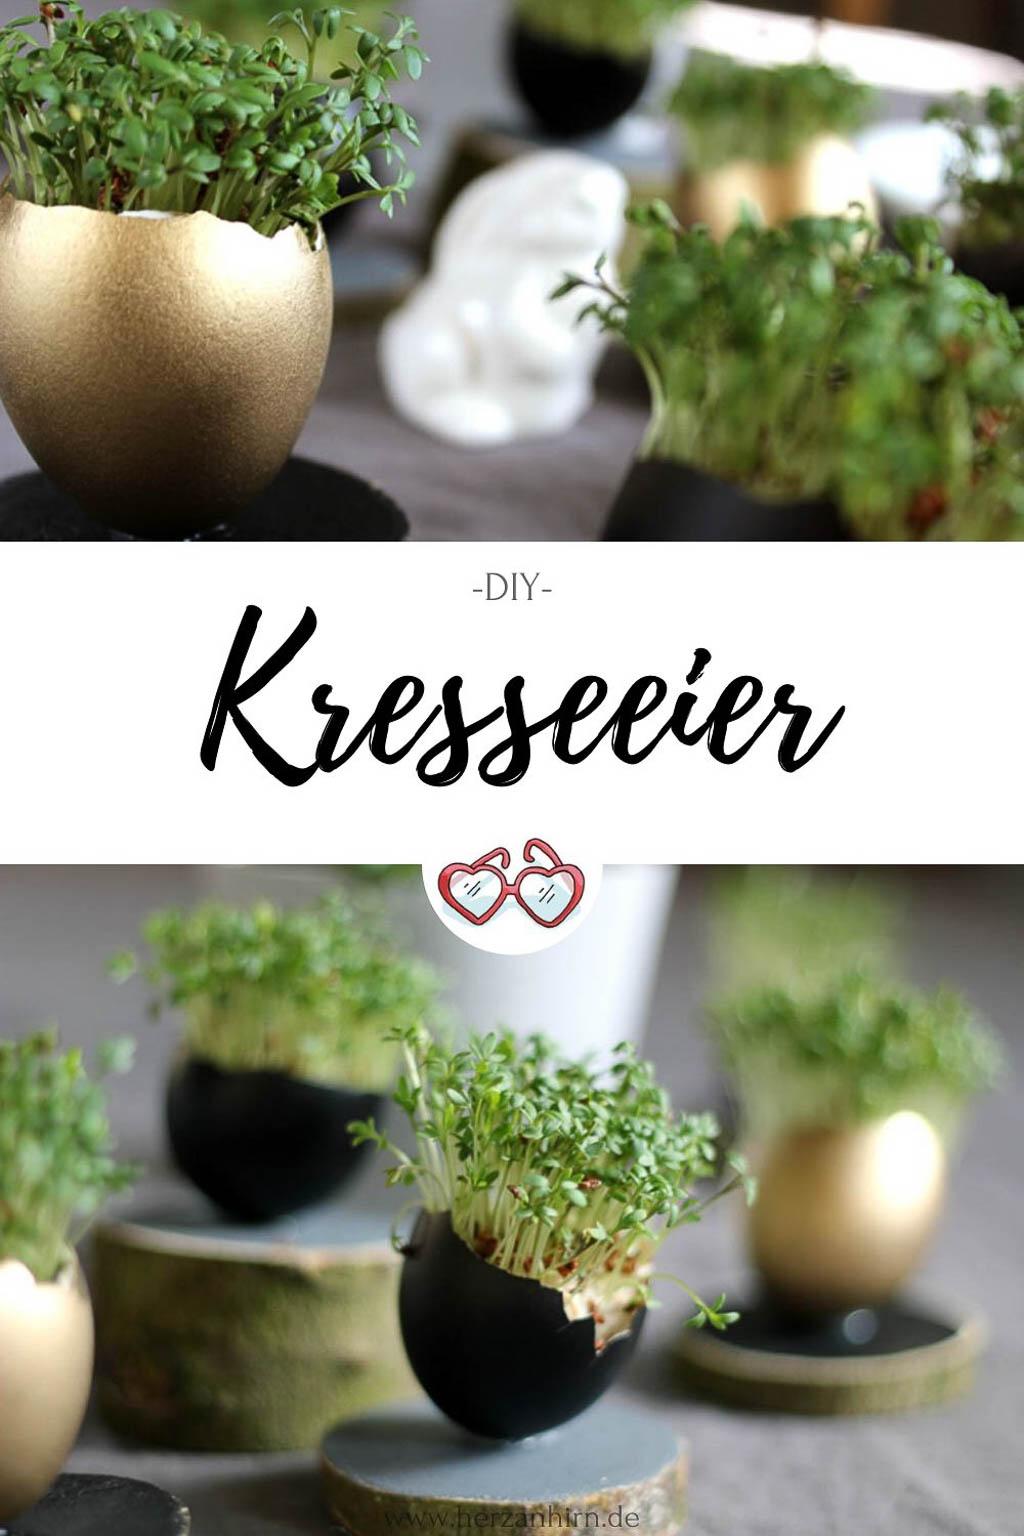 Kresseeier Pinterest Grafik